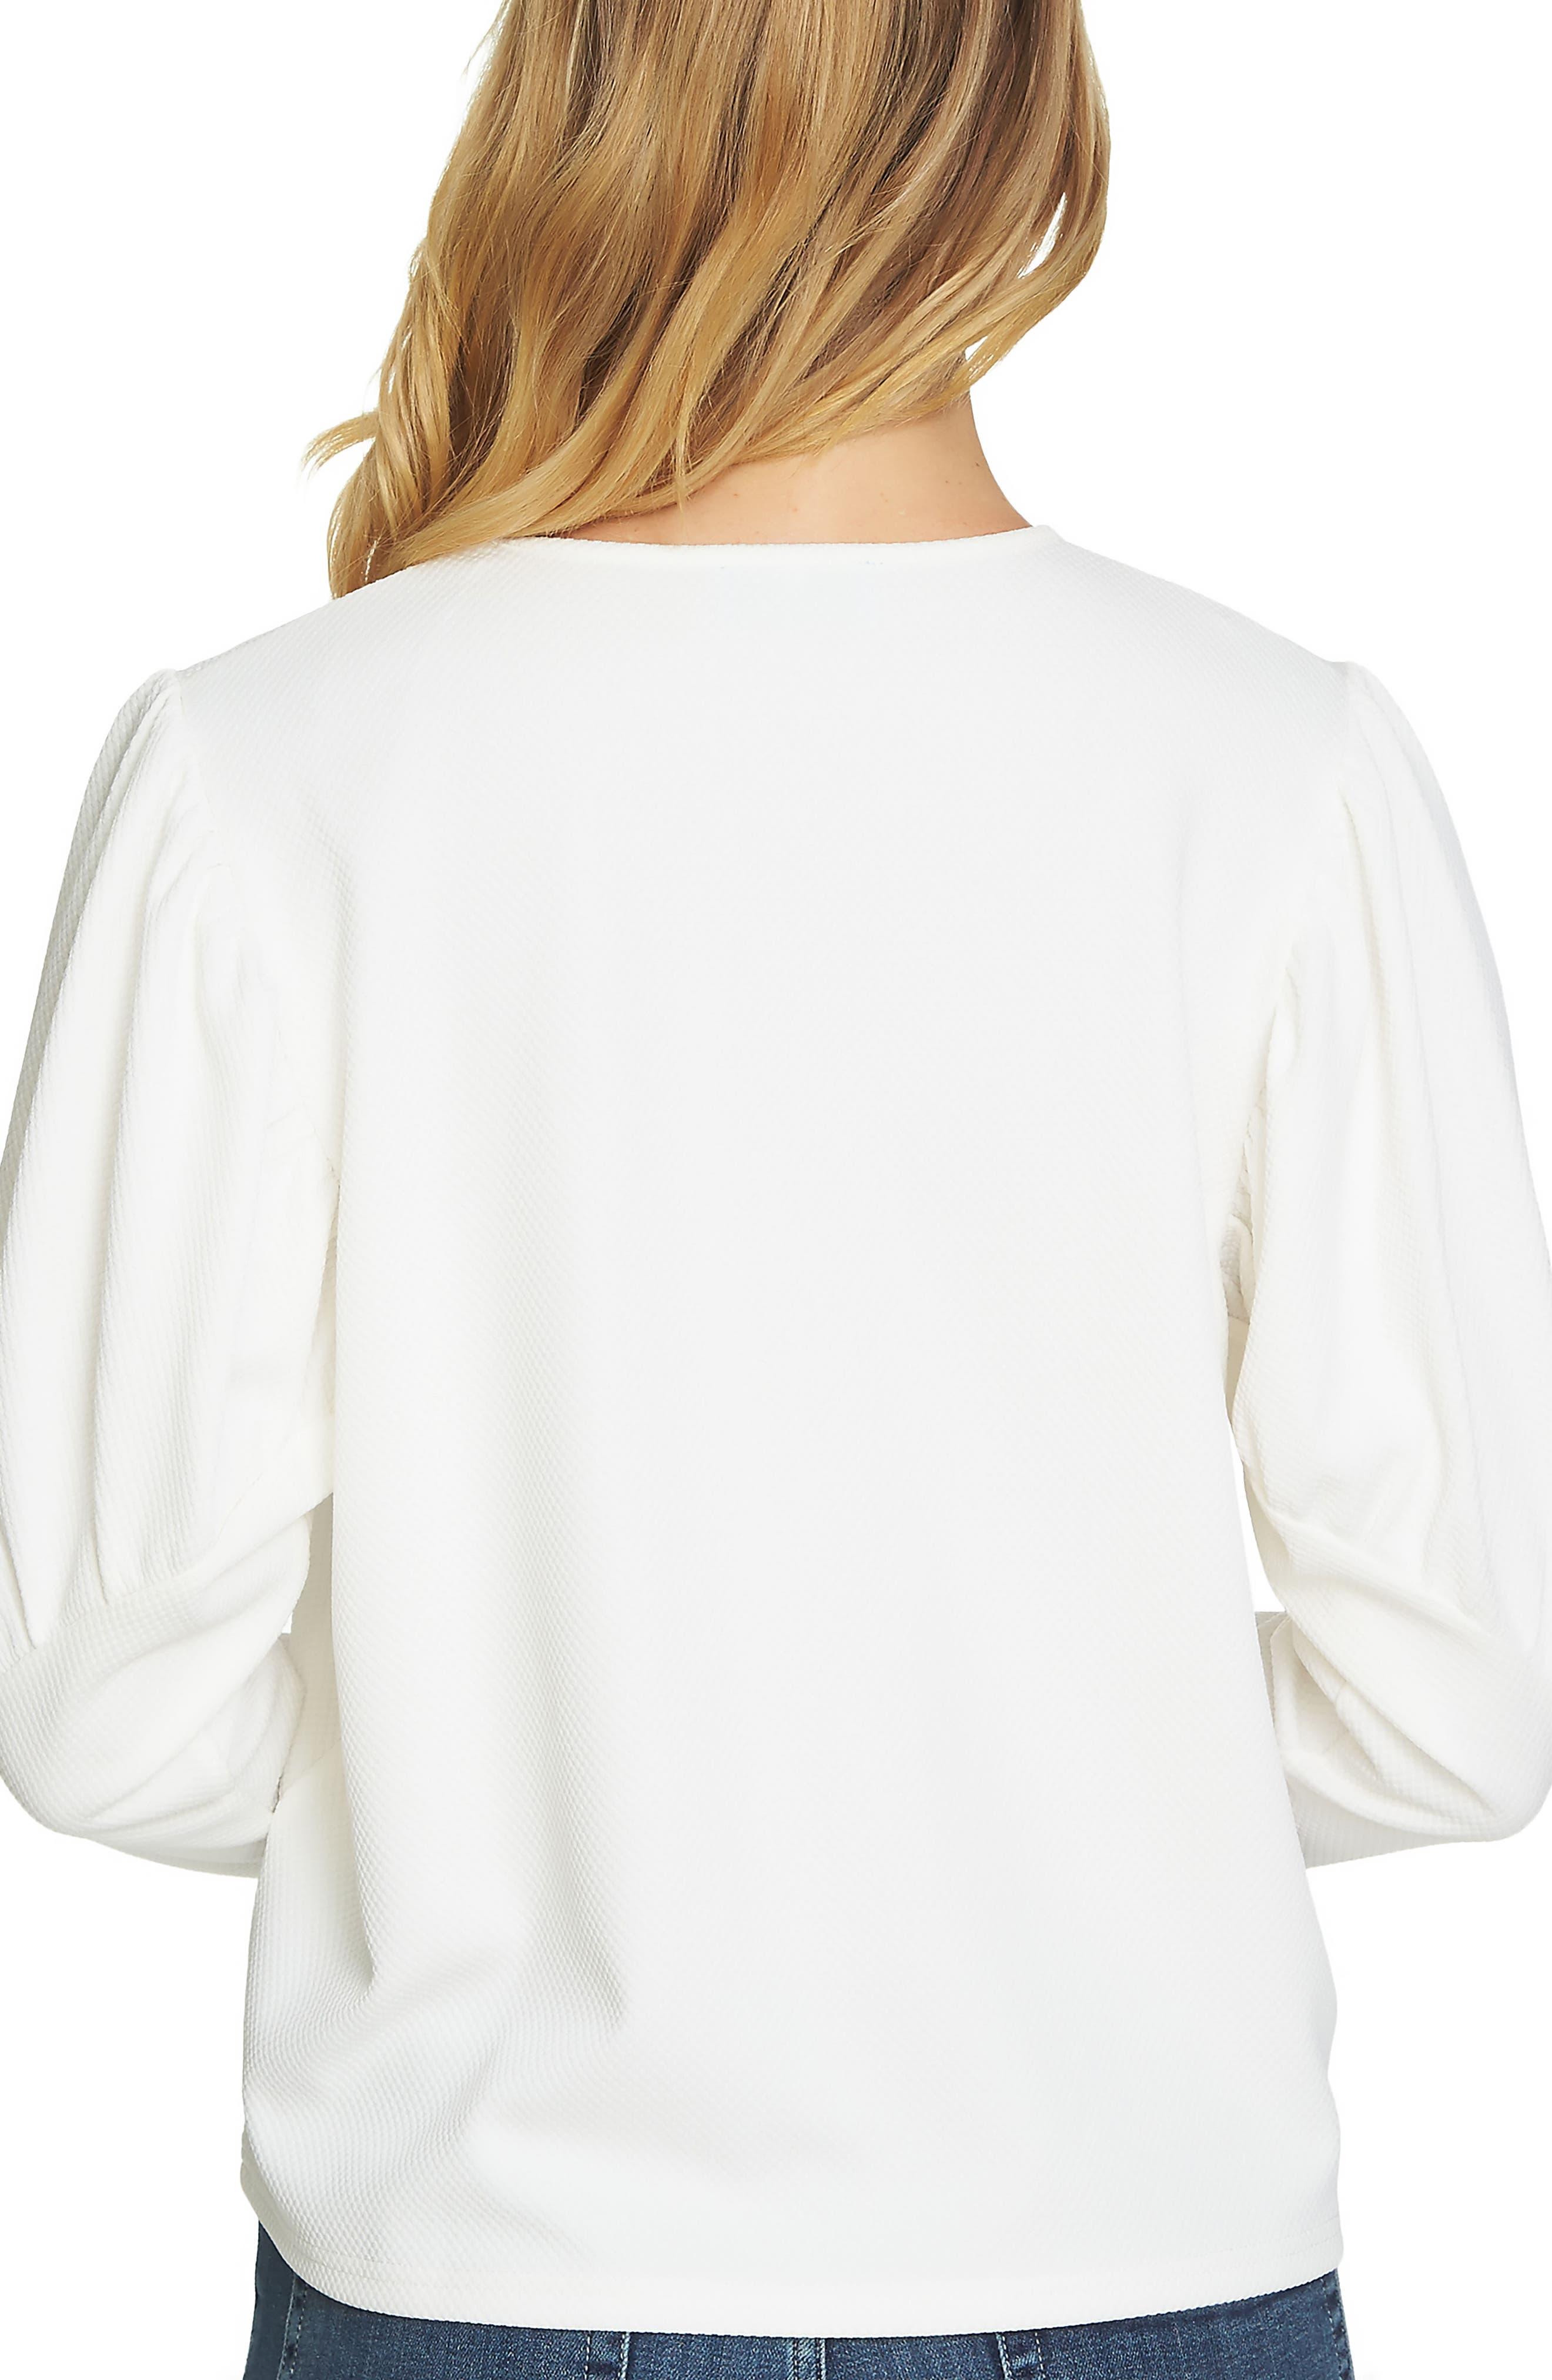 Puffed Shoulder Top,                             Alternate thumbnail 2, color,                             Antique White